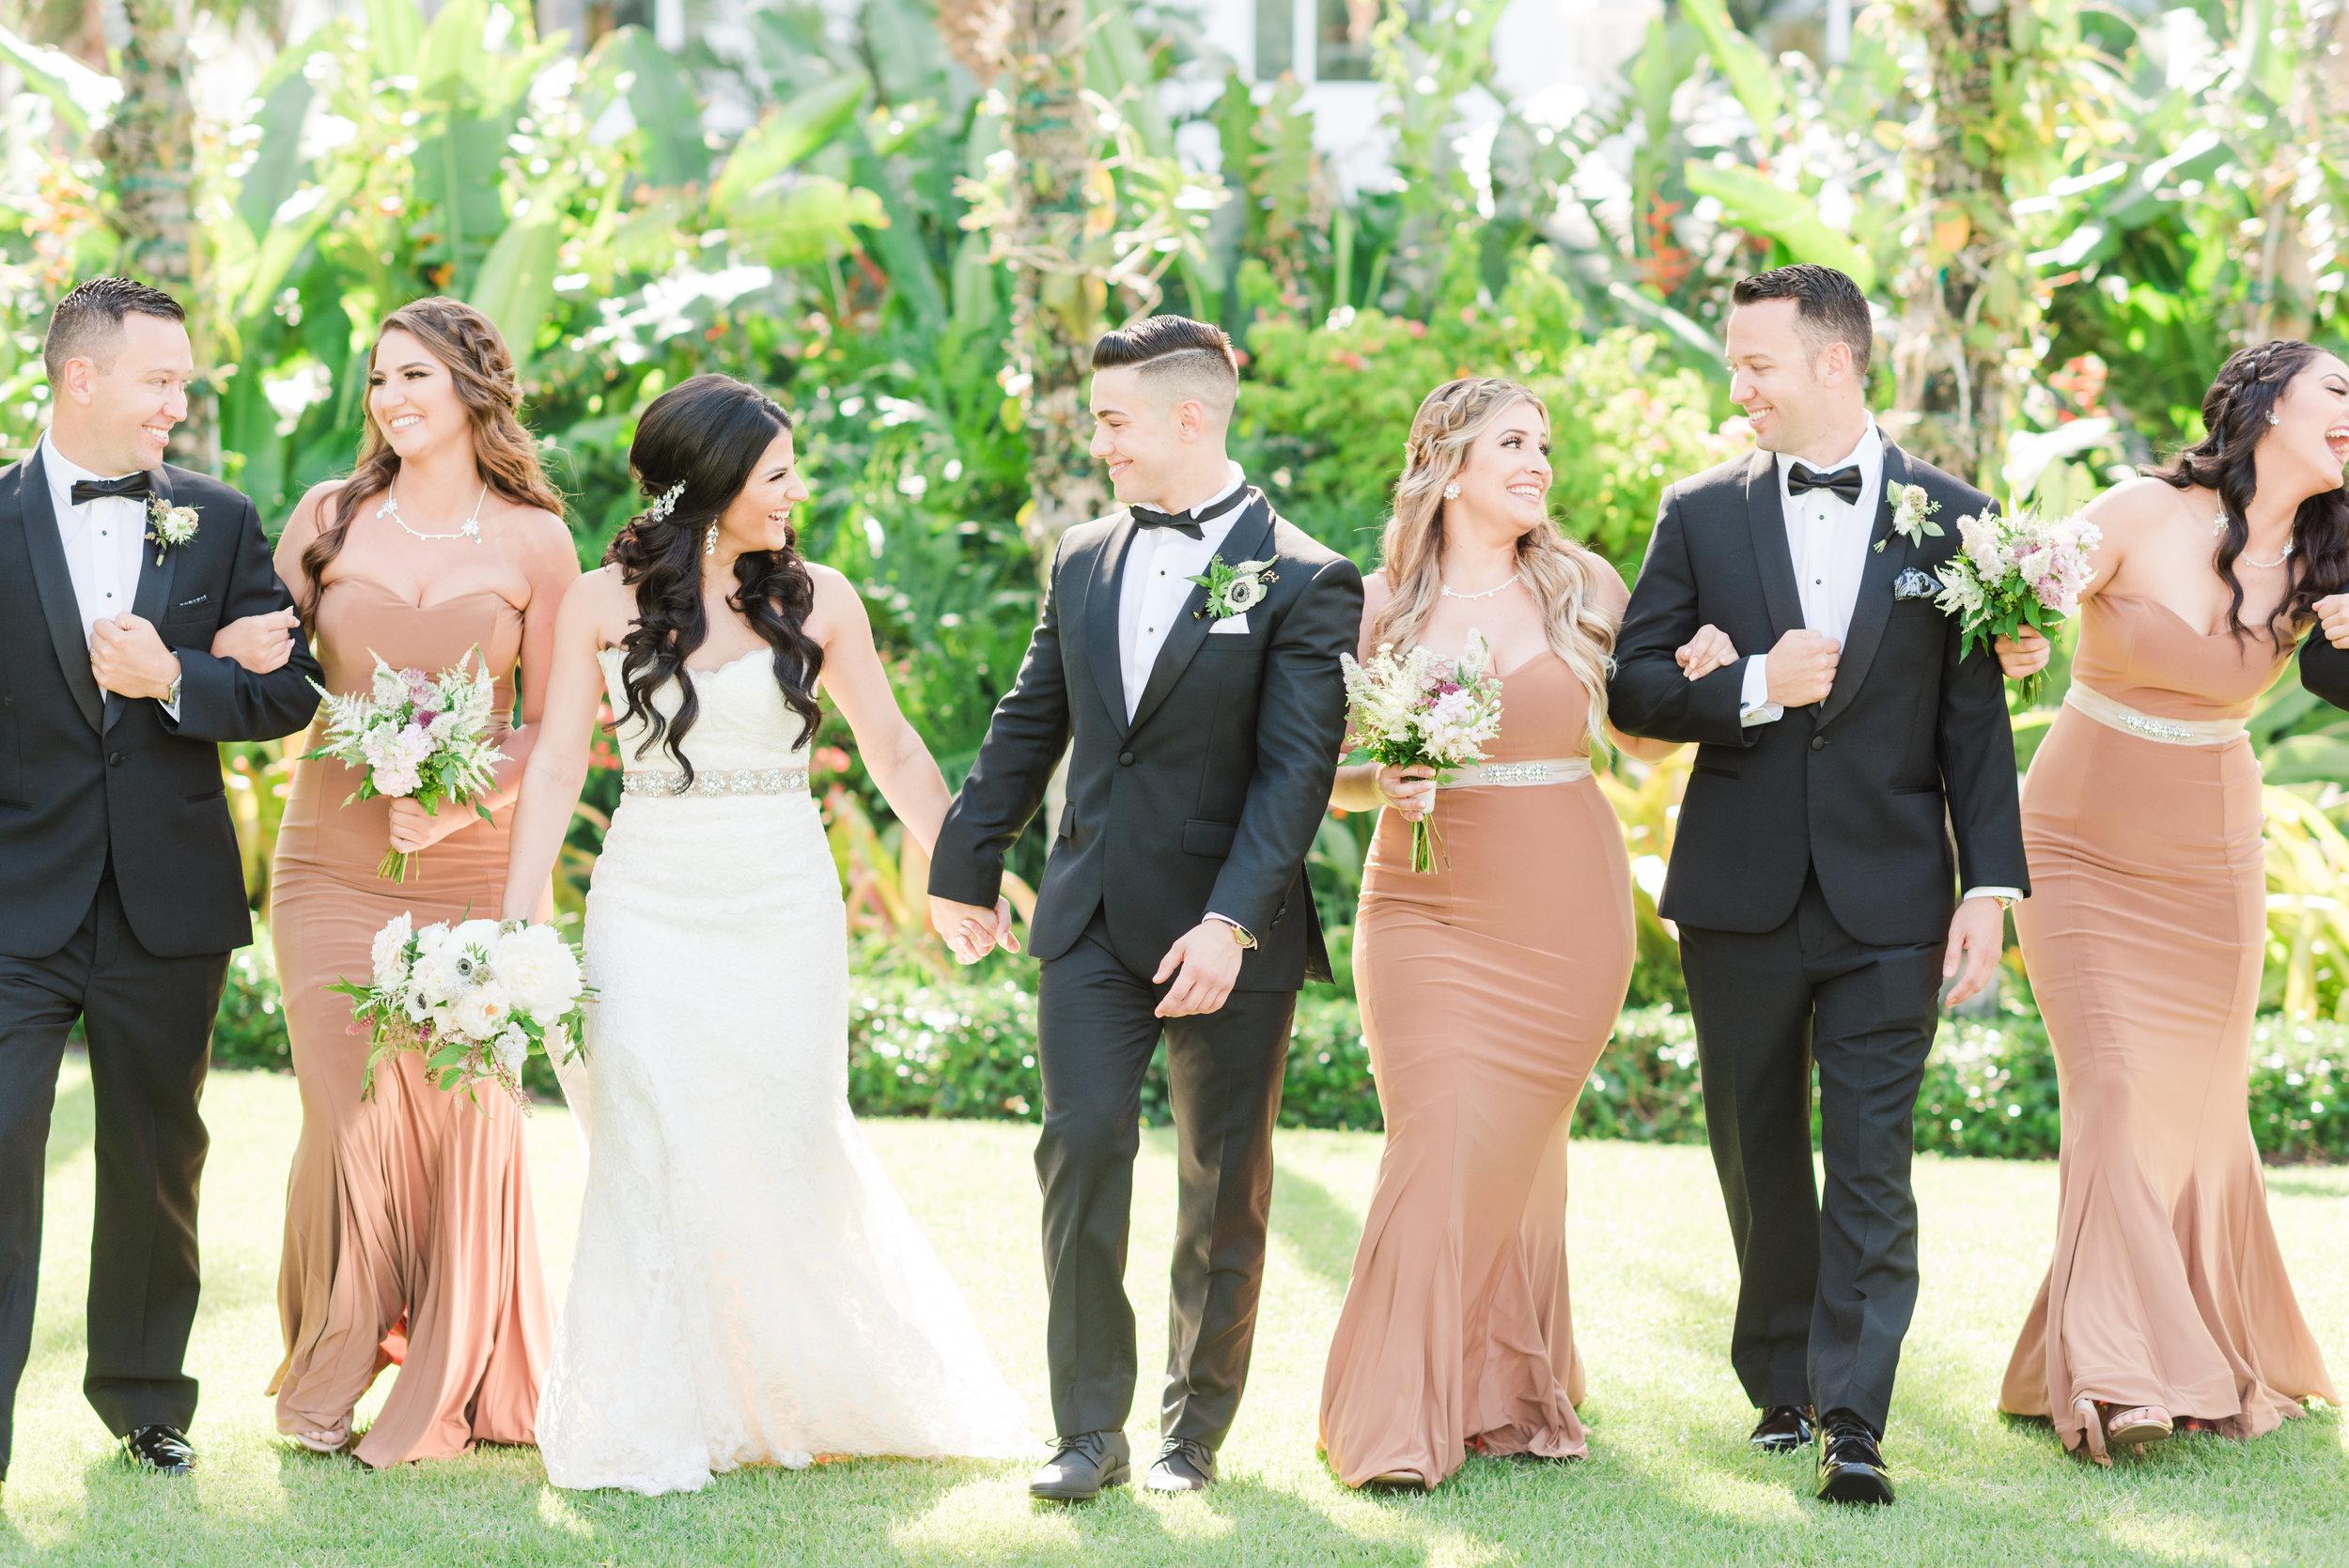 neutral-wedding-party-attire